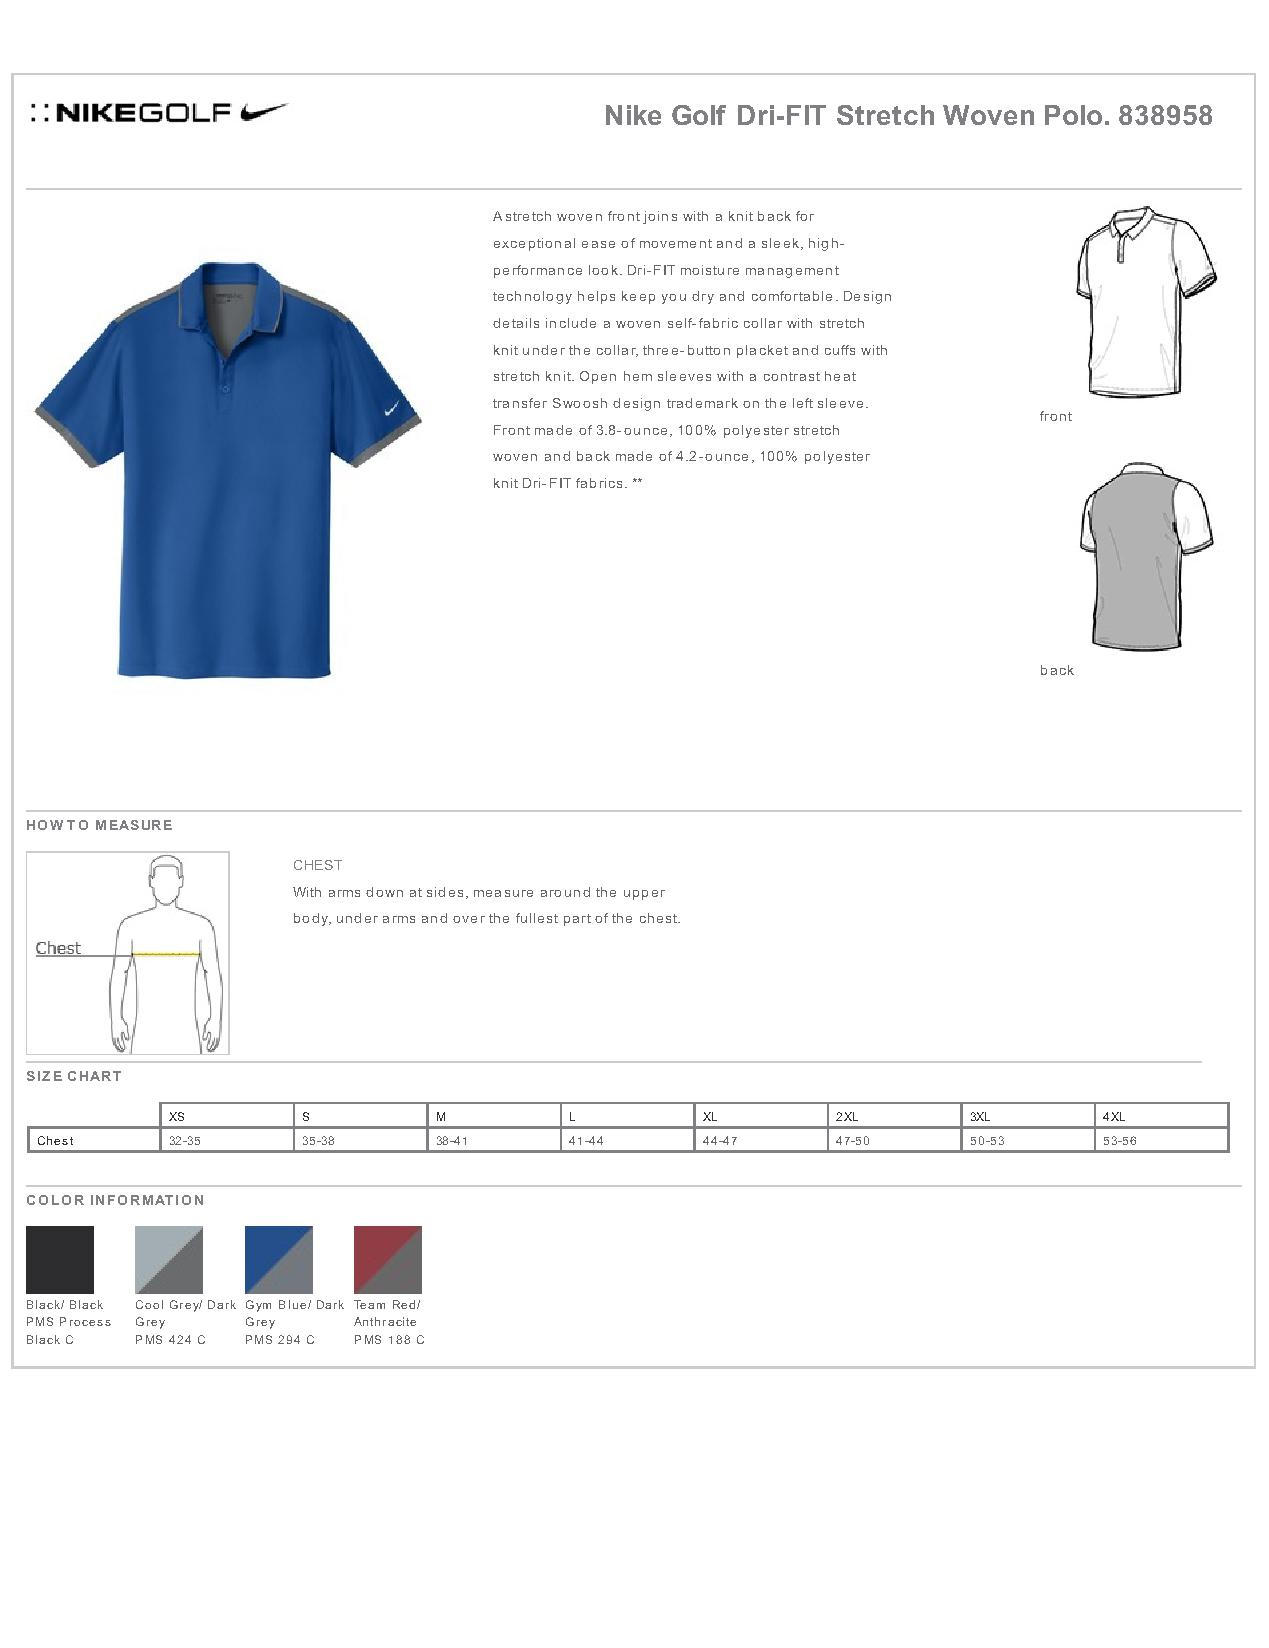 73cf8badb Nike Golf 838958 - Dri-FIT Stretch Woven Polo - Men's Sport Shirts